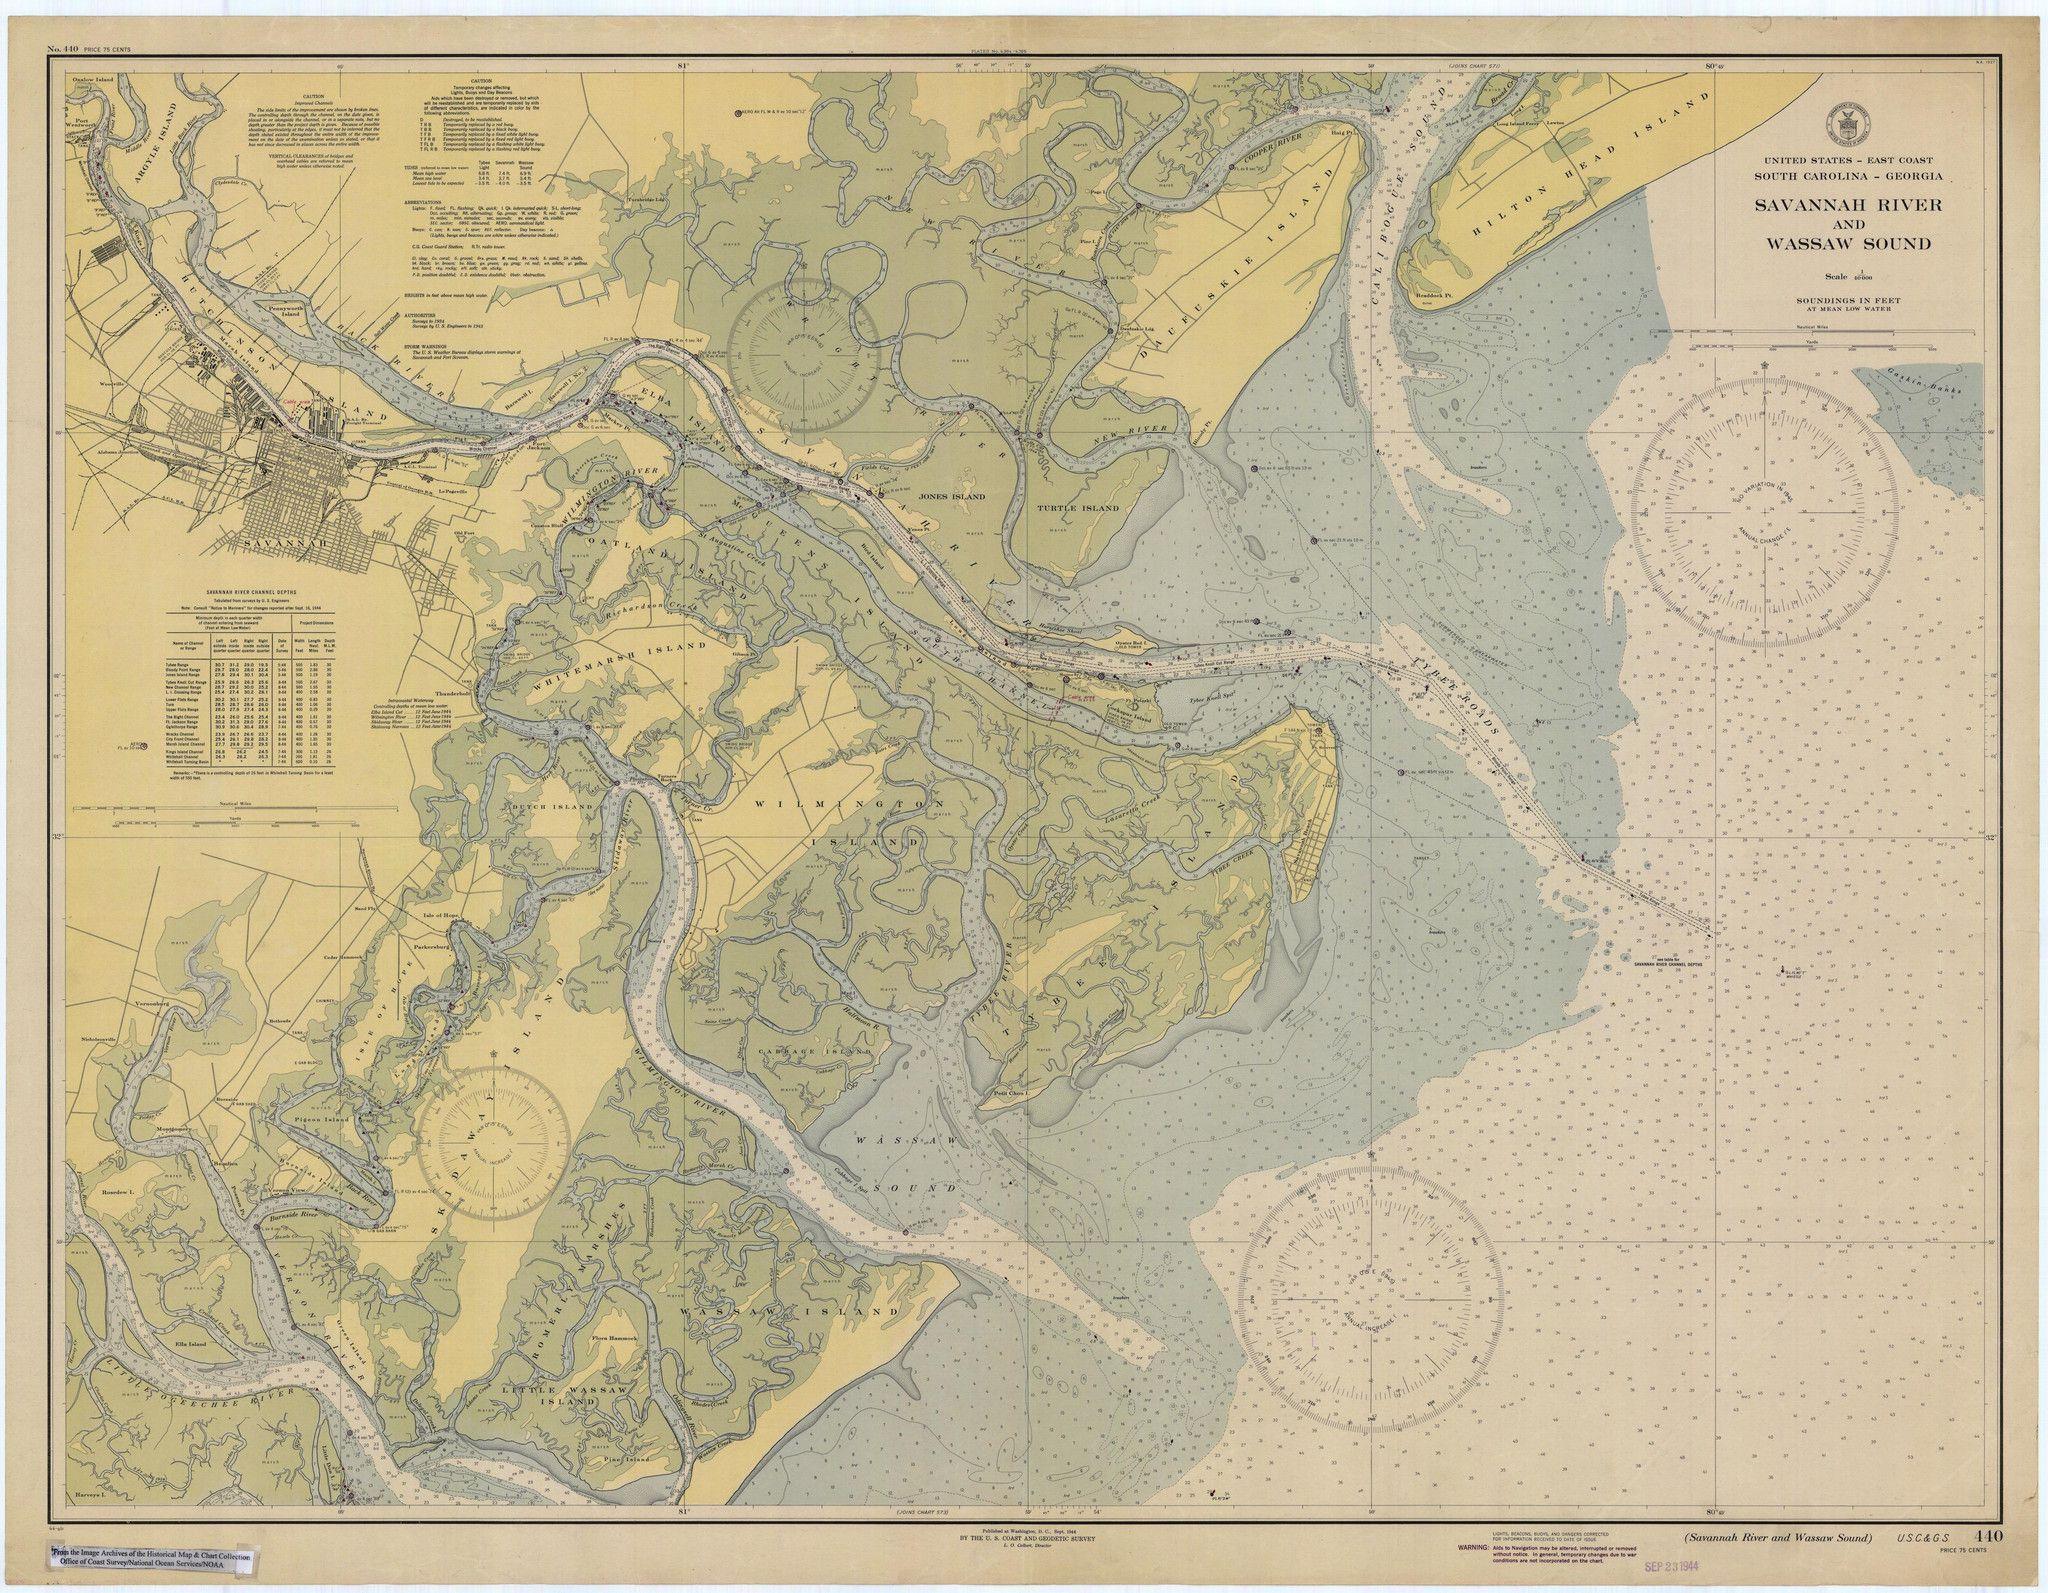 Tybee Island Savannah River Historical Map Tybee Island - Savannah river us map